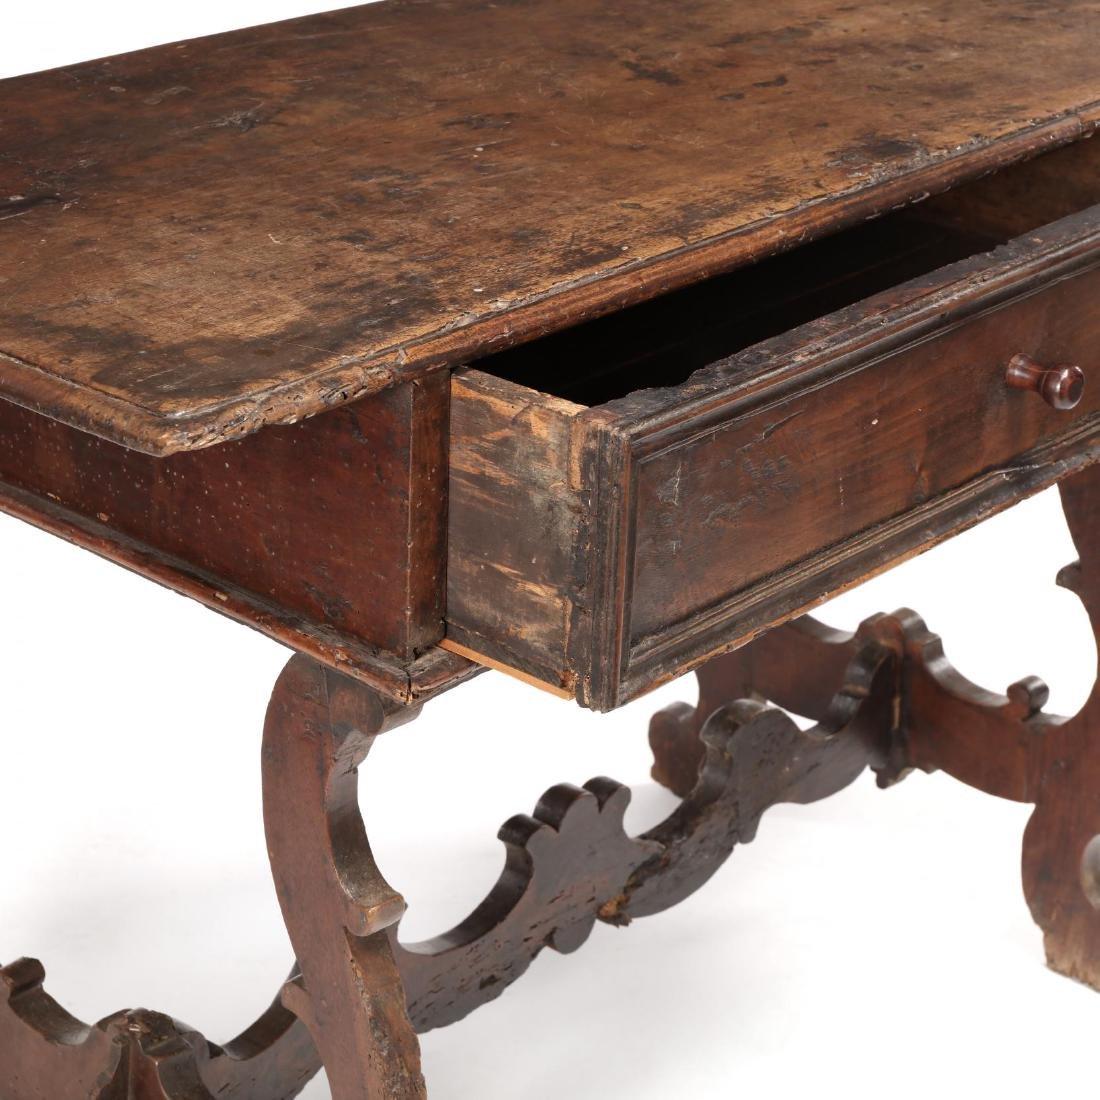 Spanish Baroque Walnut Serving Table - 4